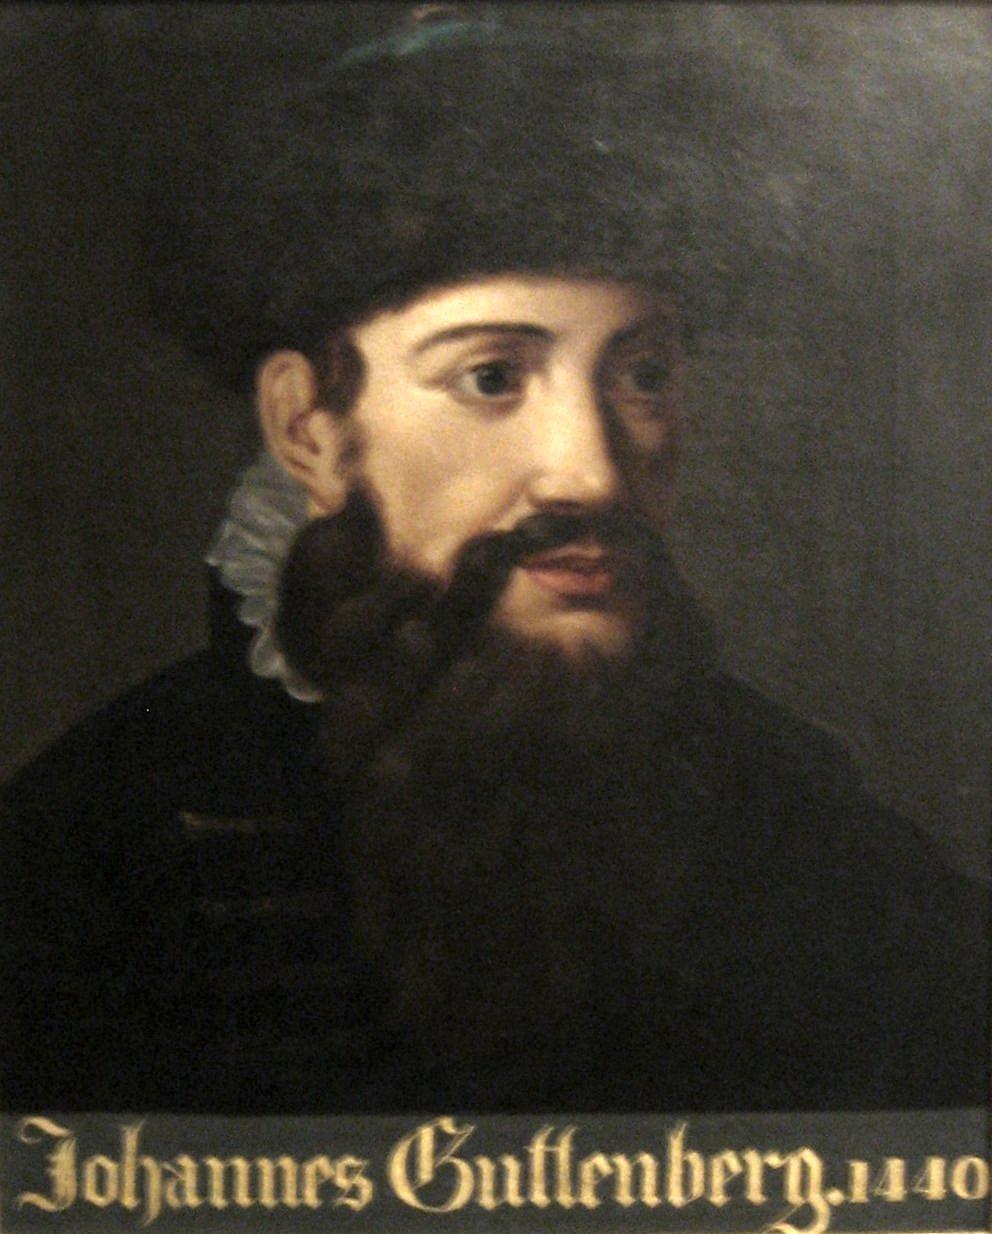 Anonymous_portrait_of_Johannes_Gutenberg_dated_1440,_Gutenberg_Museum.JPG